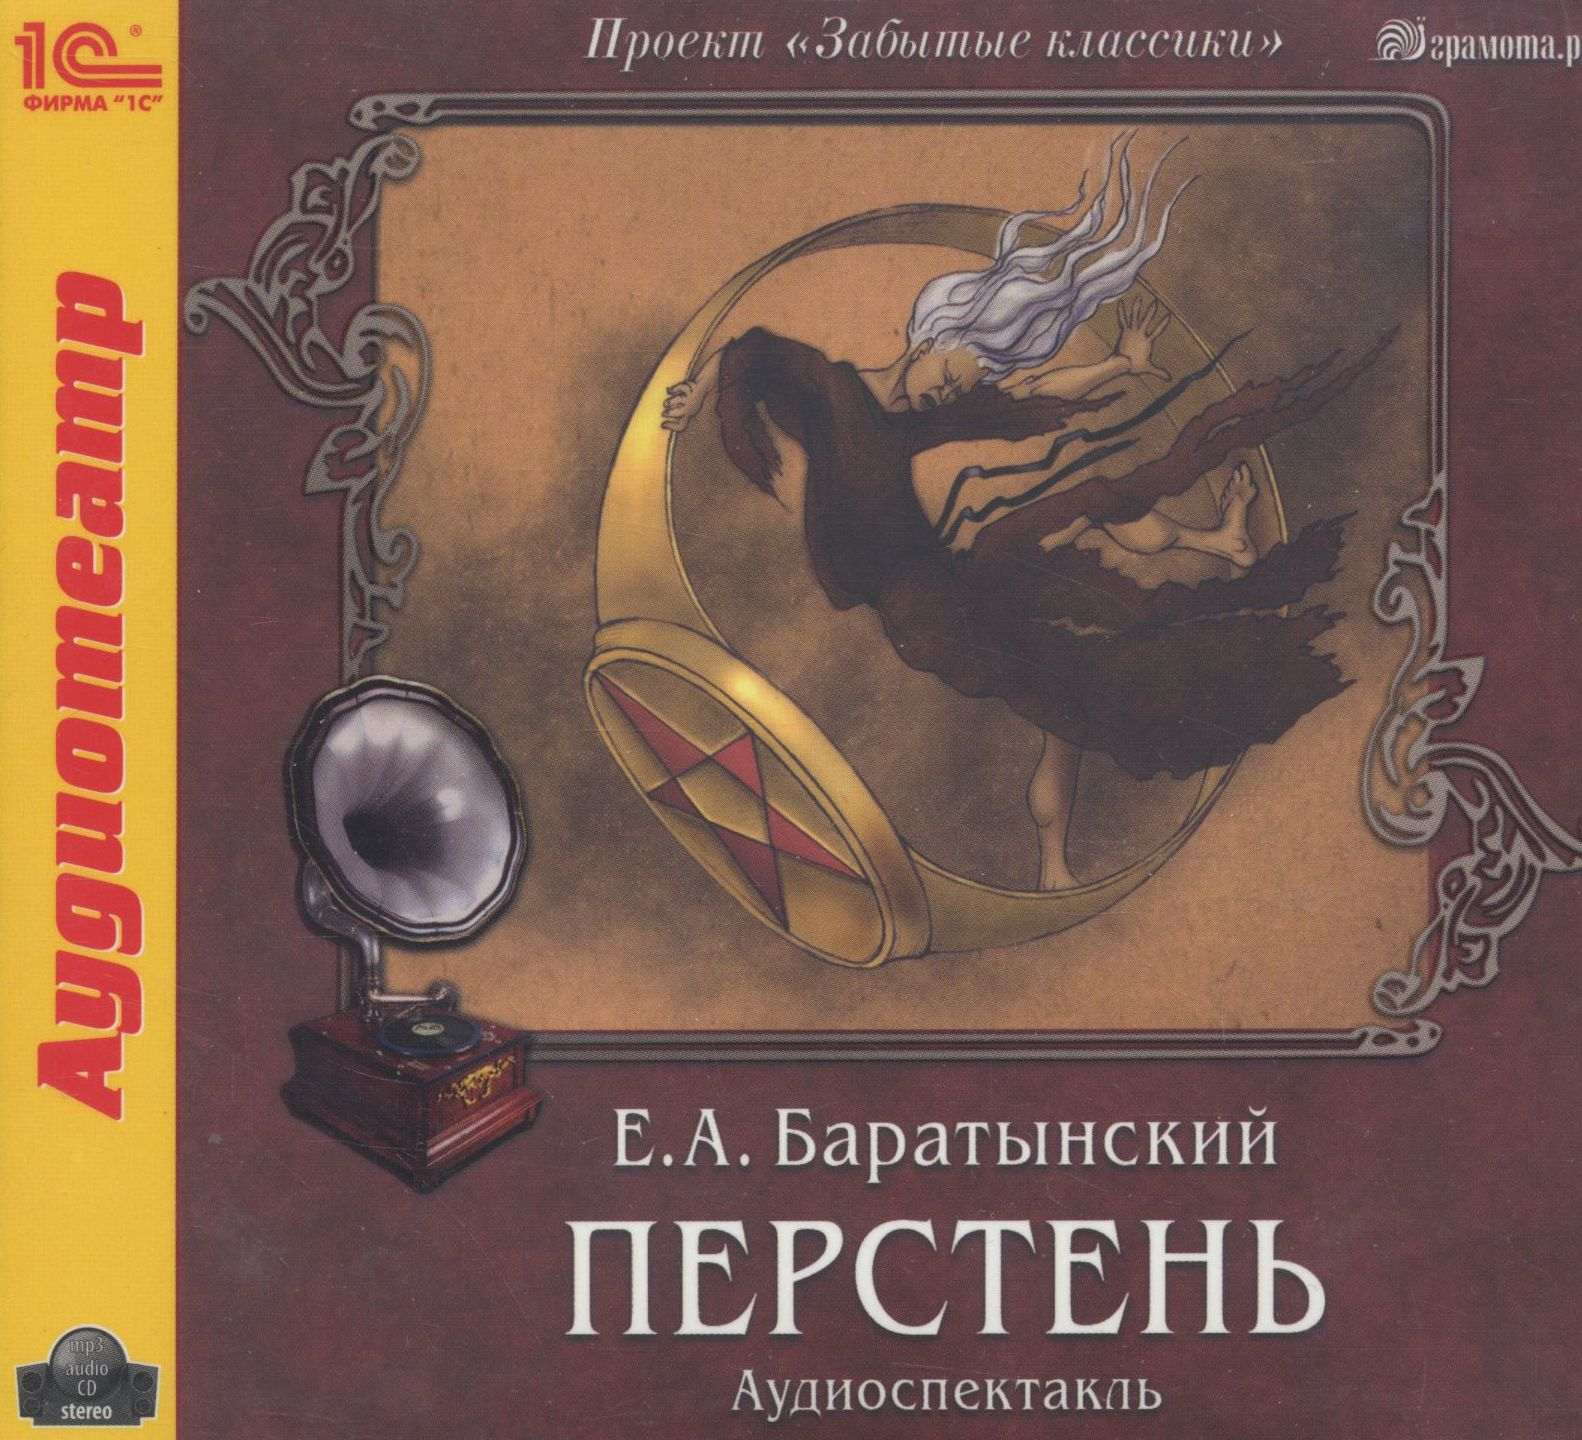 Александру рейтлингеру